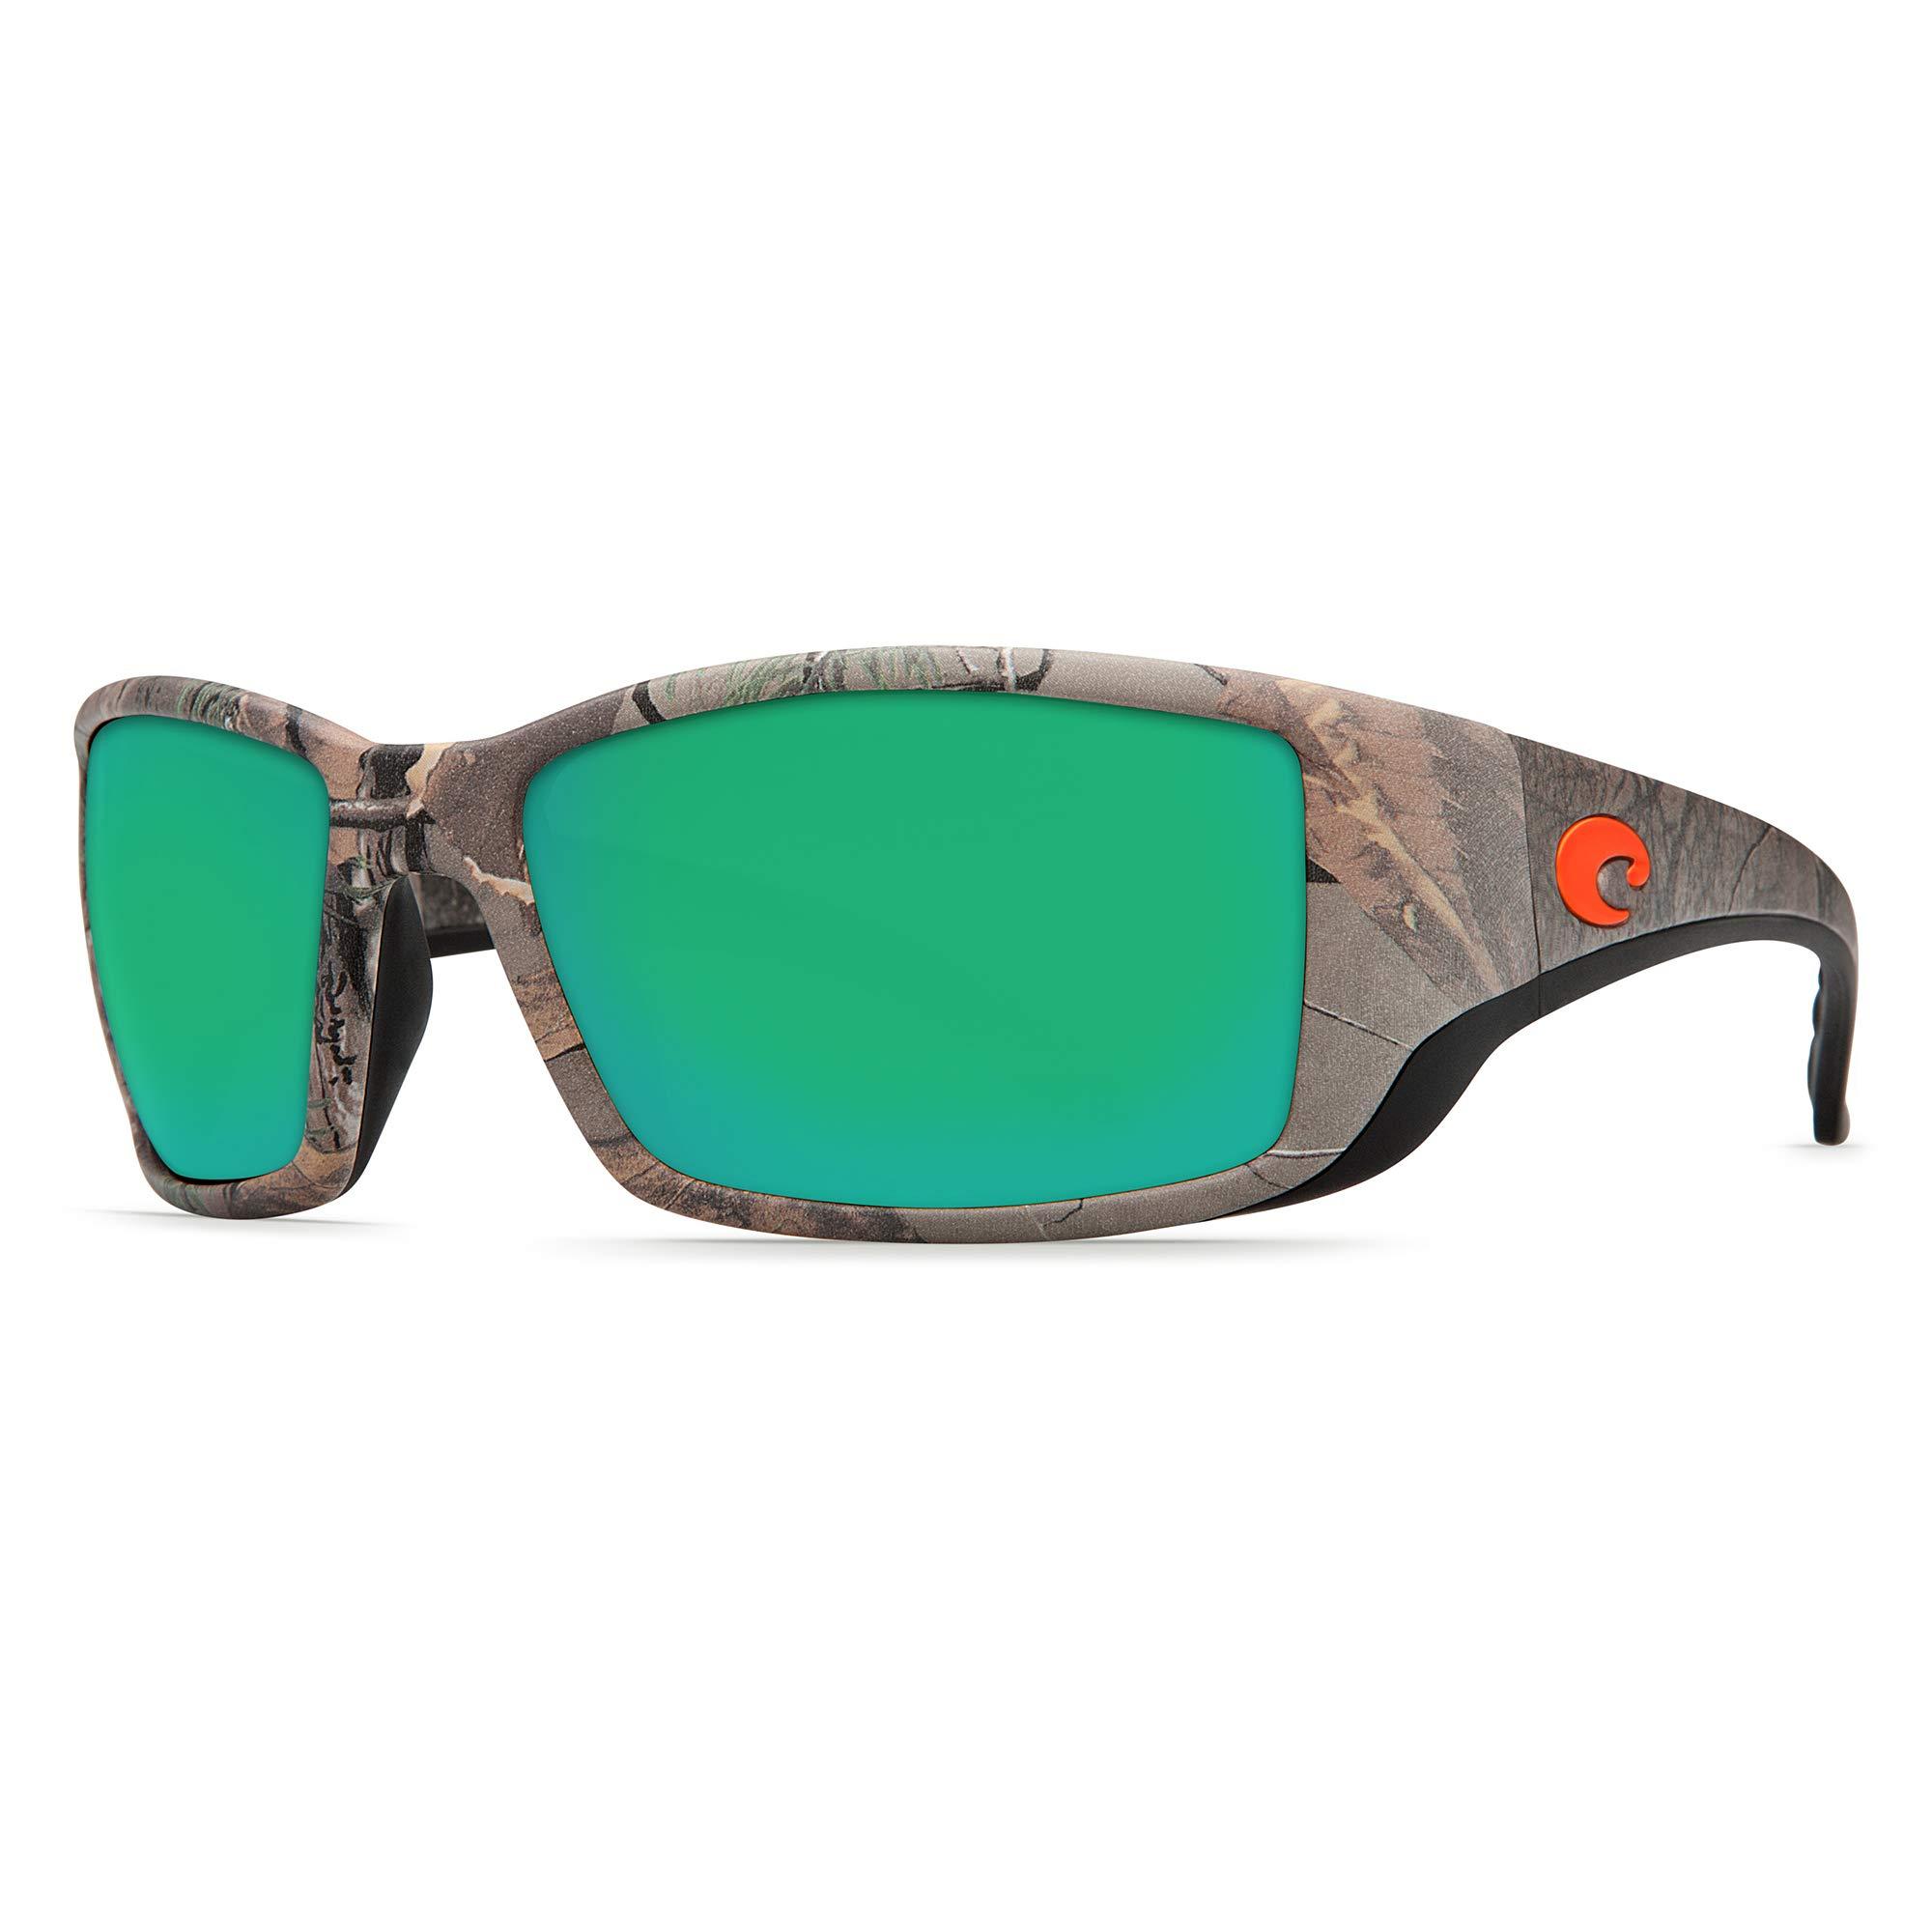 Costa Del Mar Blackfin Sunglasses Realtree Xtra Green/Realtree Xtra Camo Mirror 400Glass